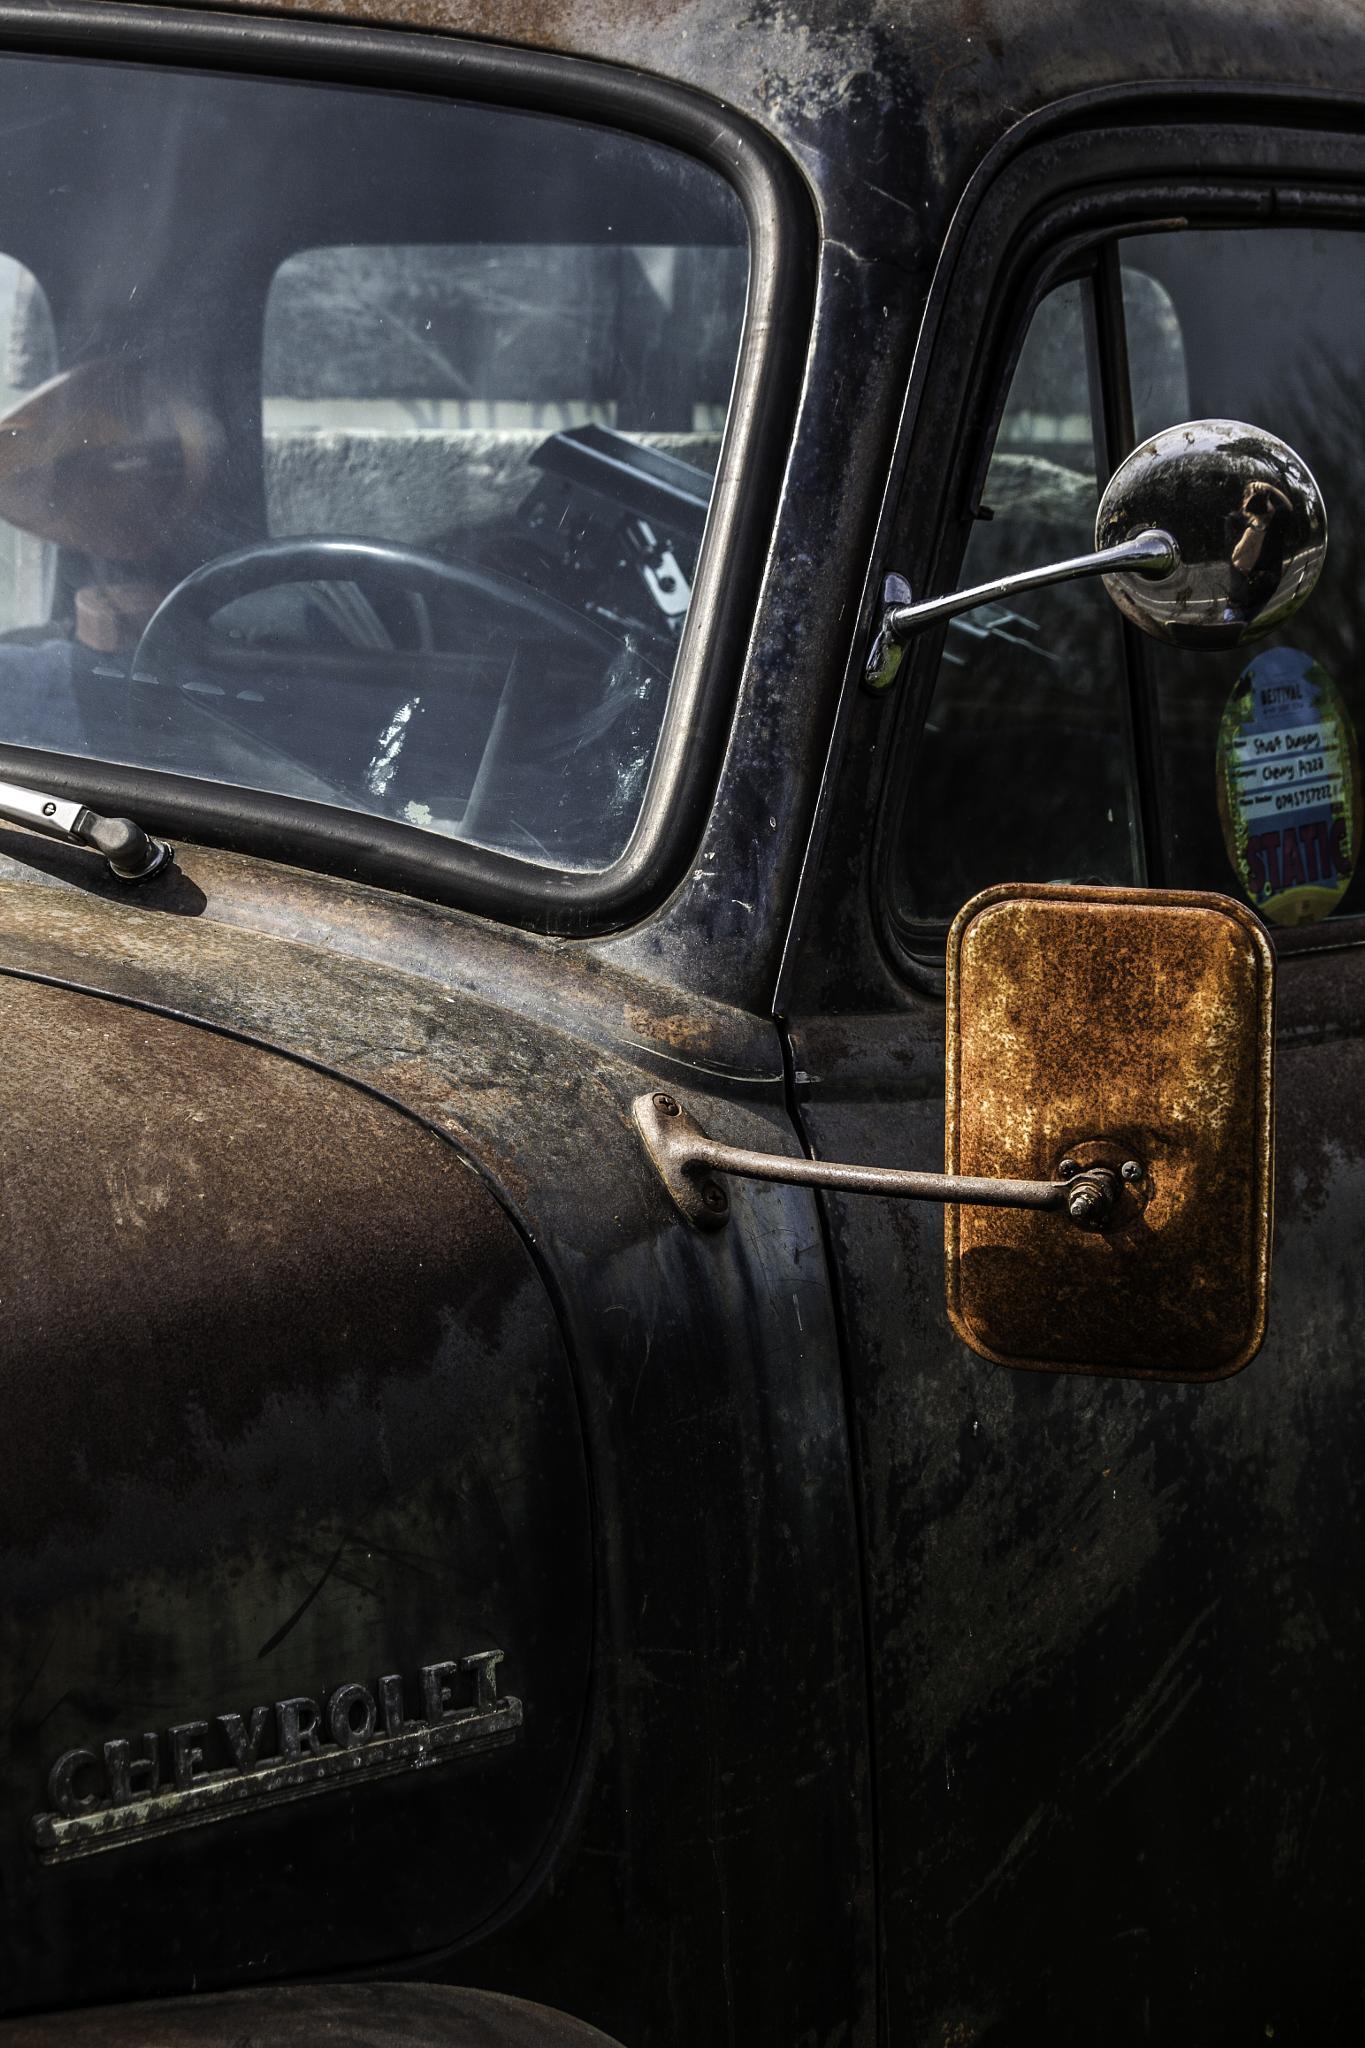 Chevrolet Step side truck by morpheus1955